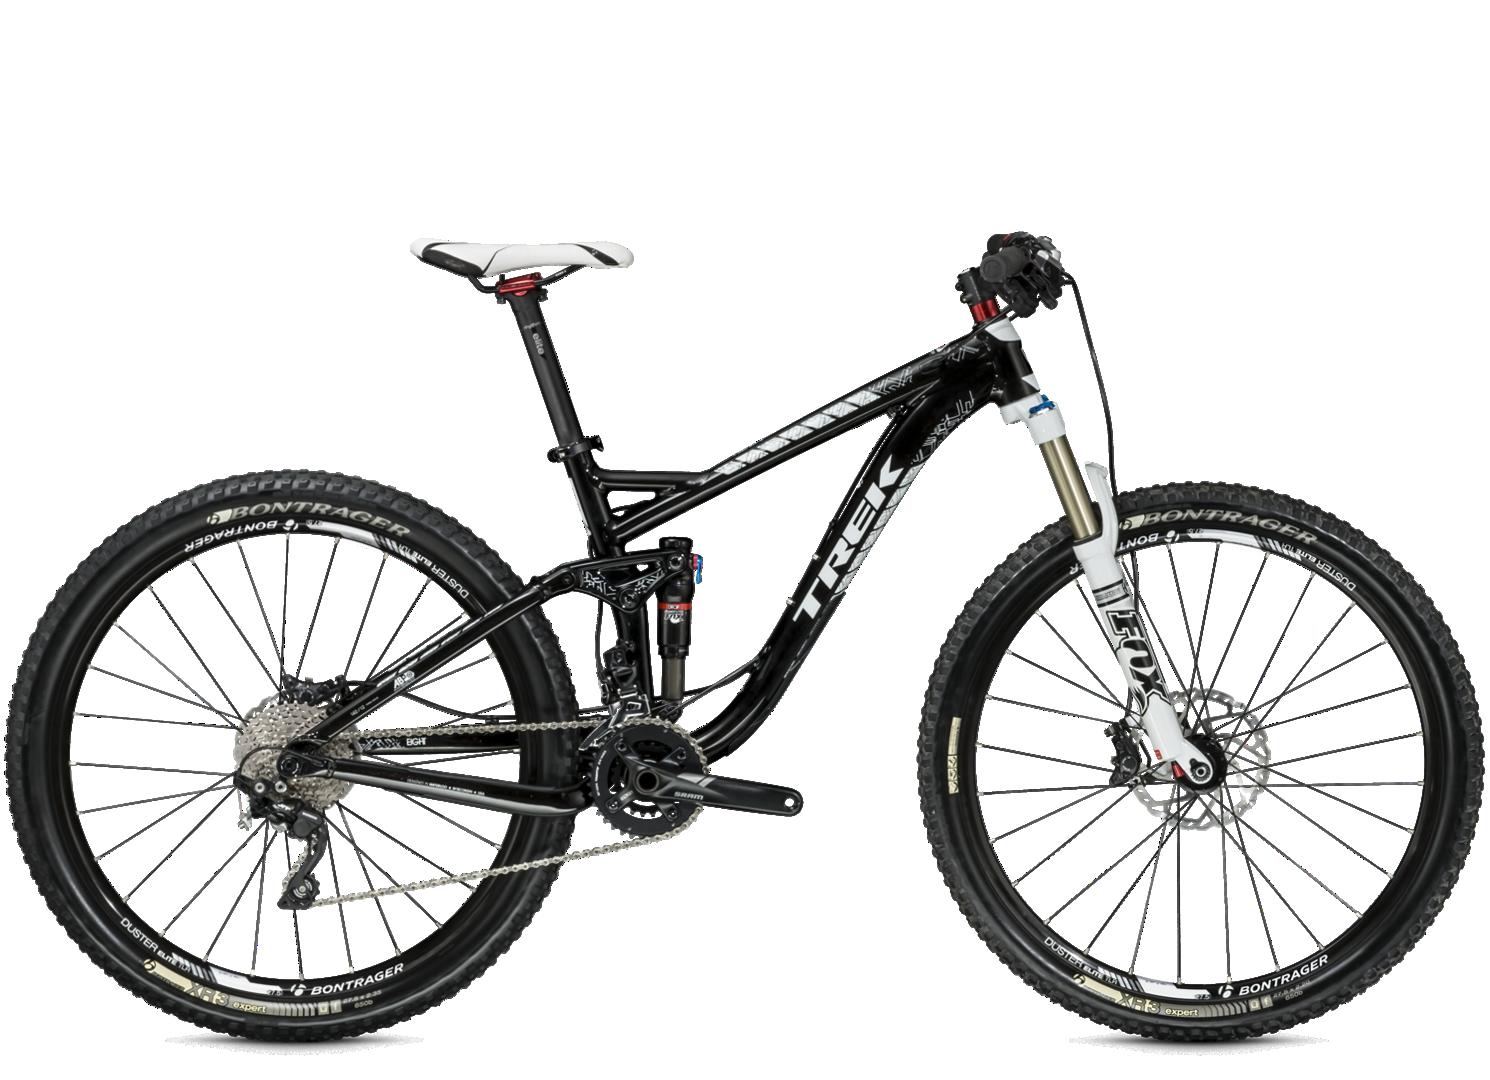 Trek Fuel Ex 8 27 5 With Images Trek Bicycle Trek Bikes Bicycle